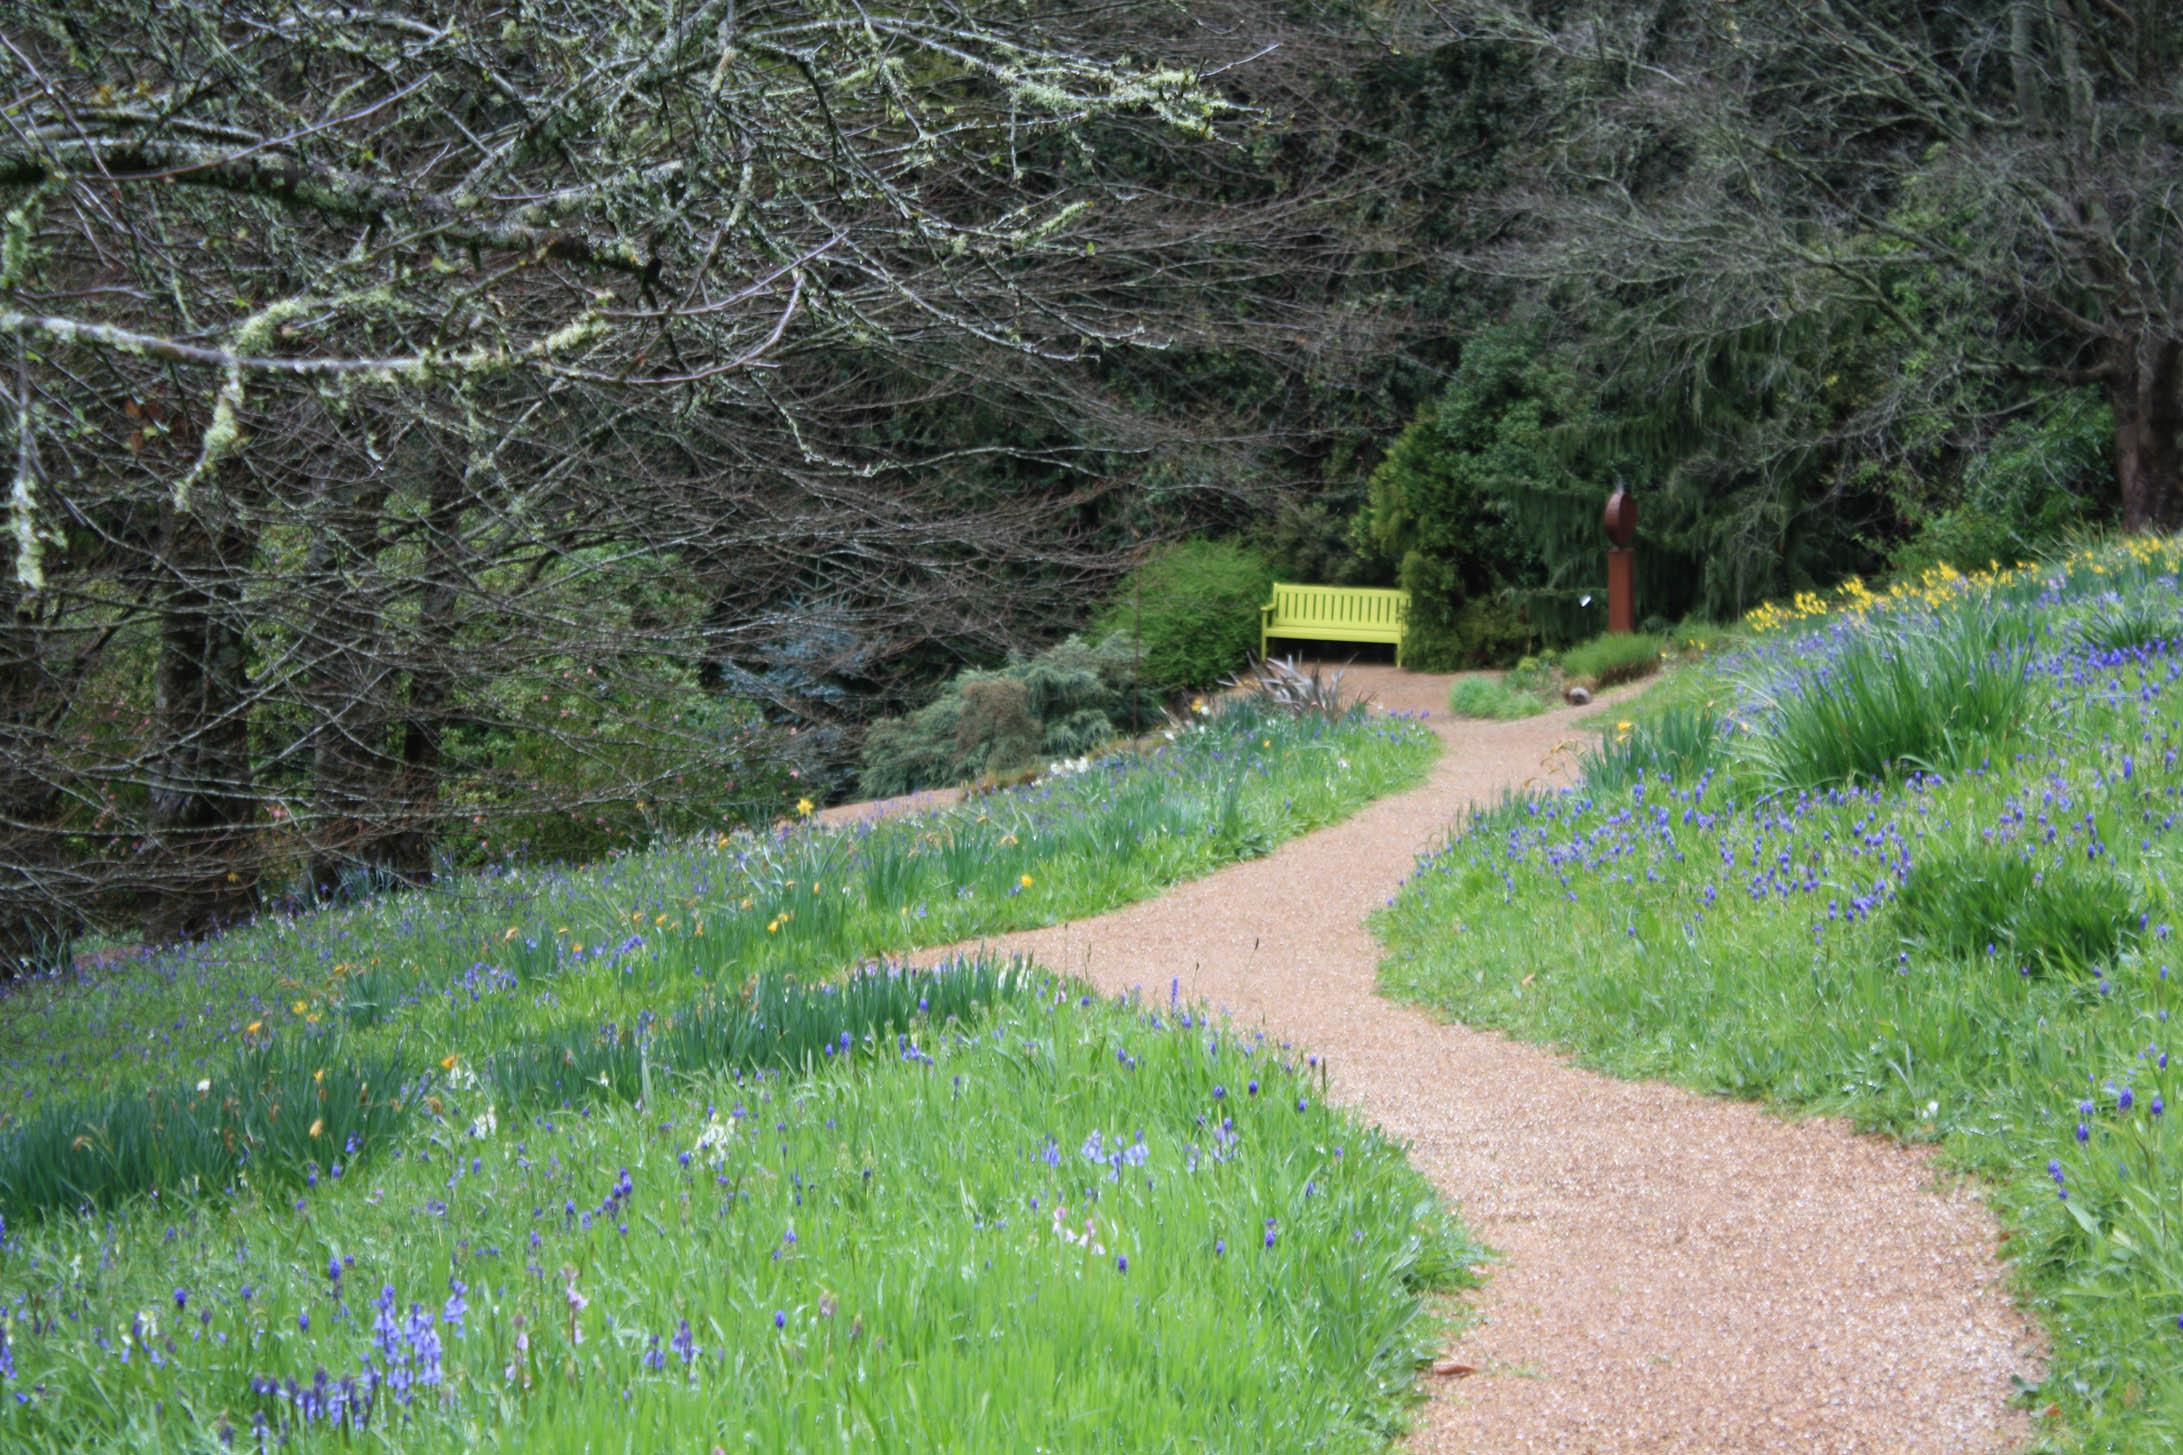 Inspirational Gardens image